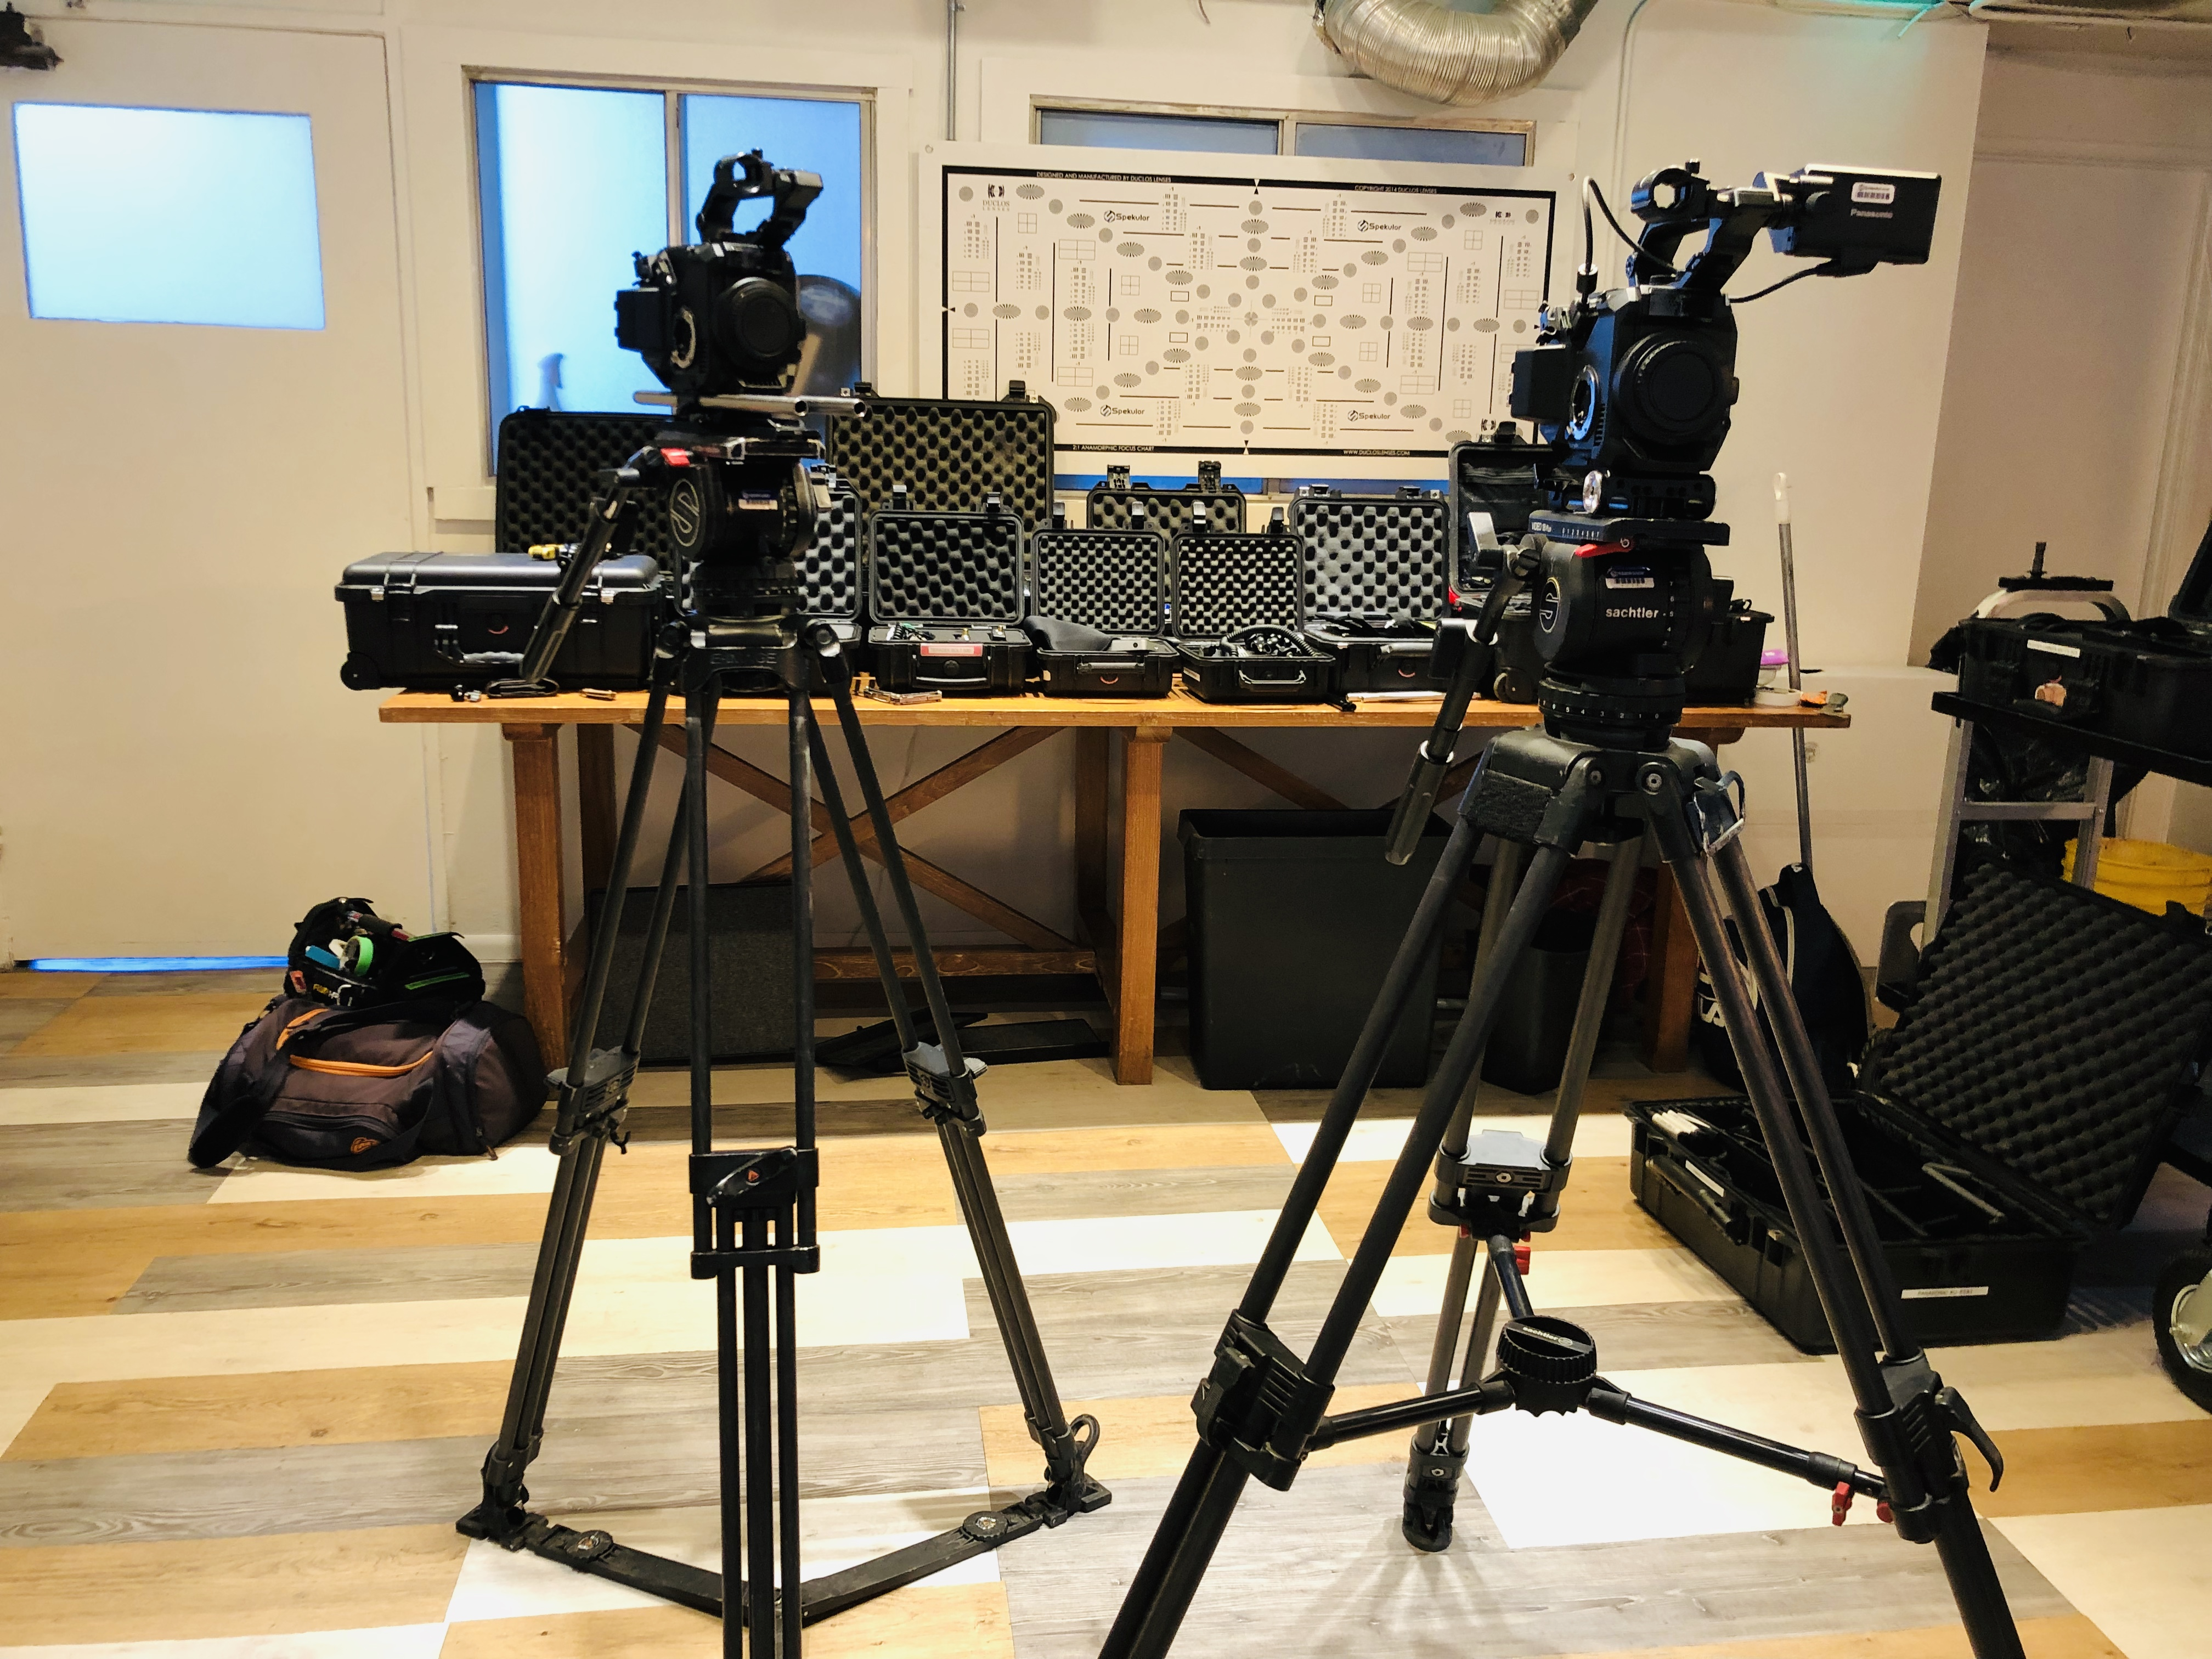 spekulor cinema gear rentals and product